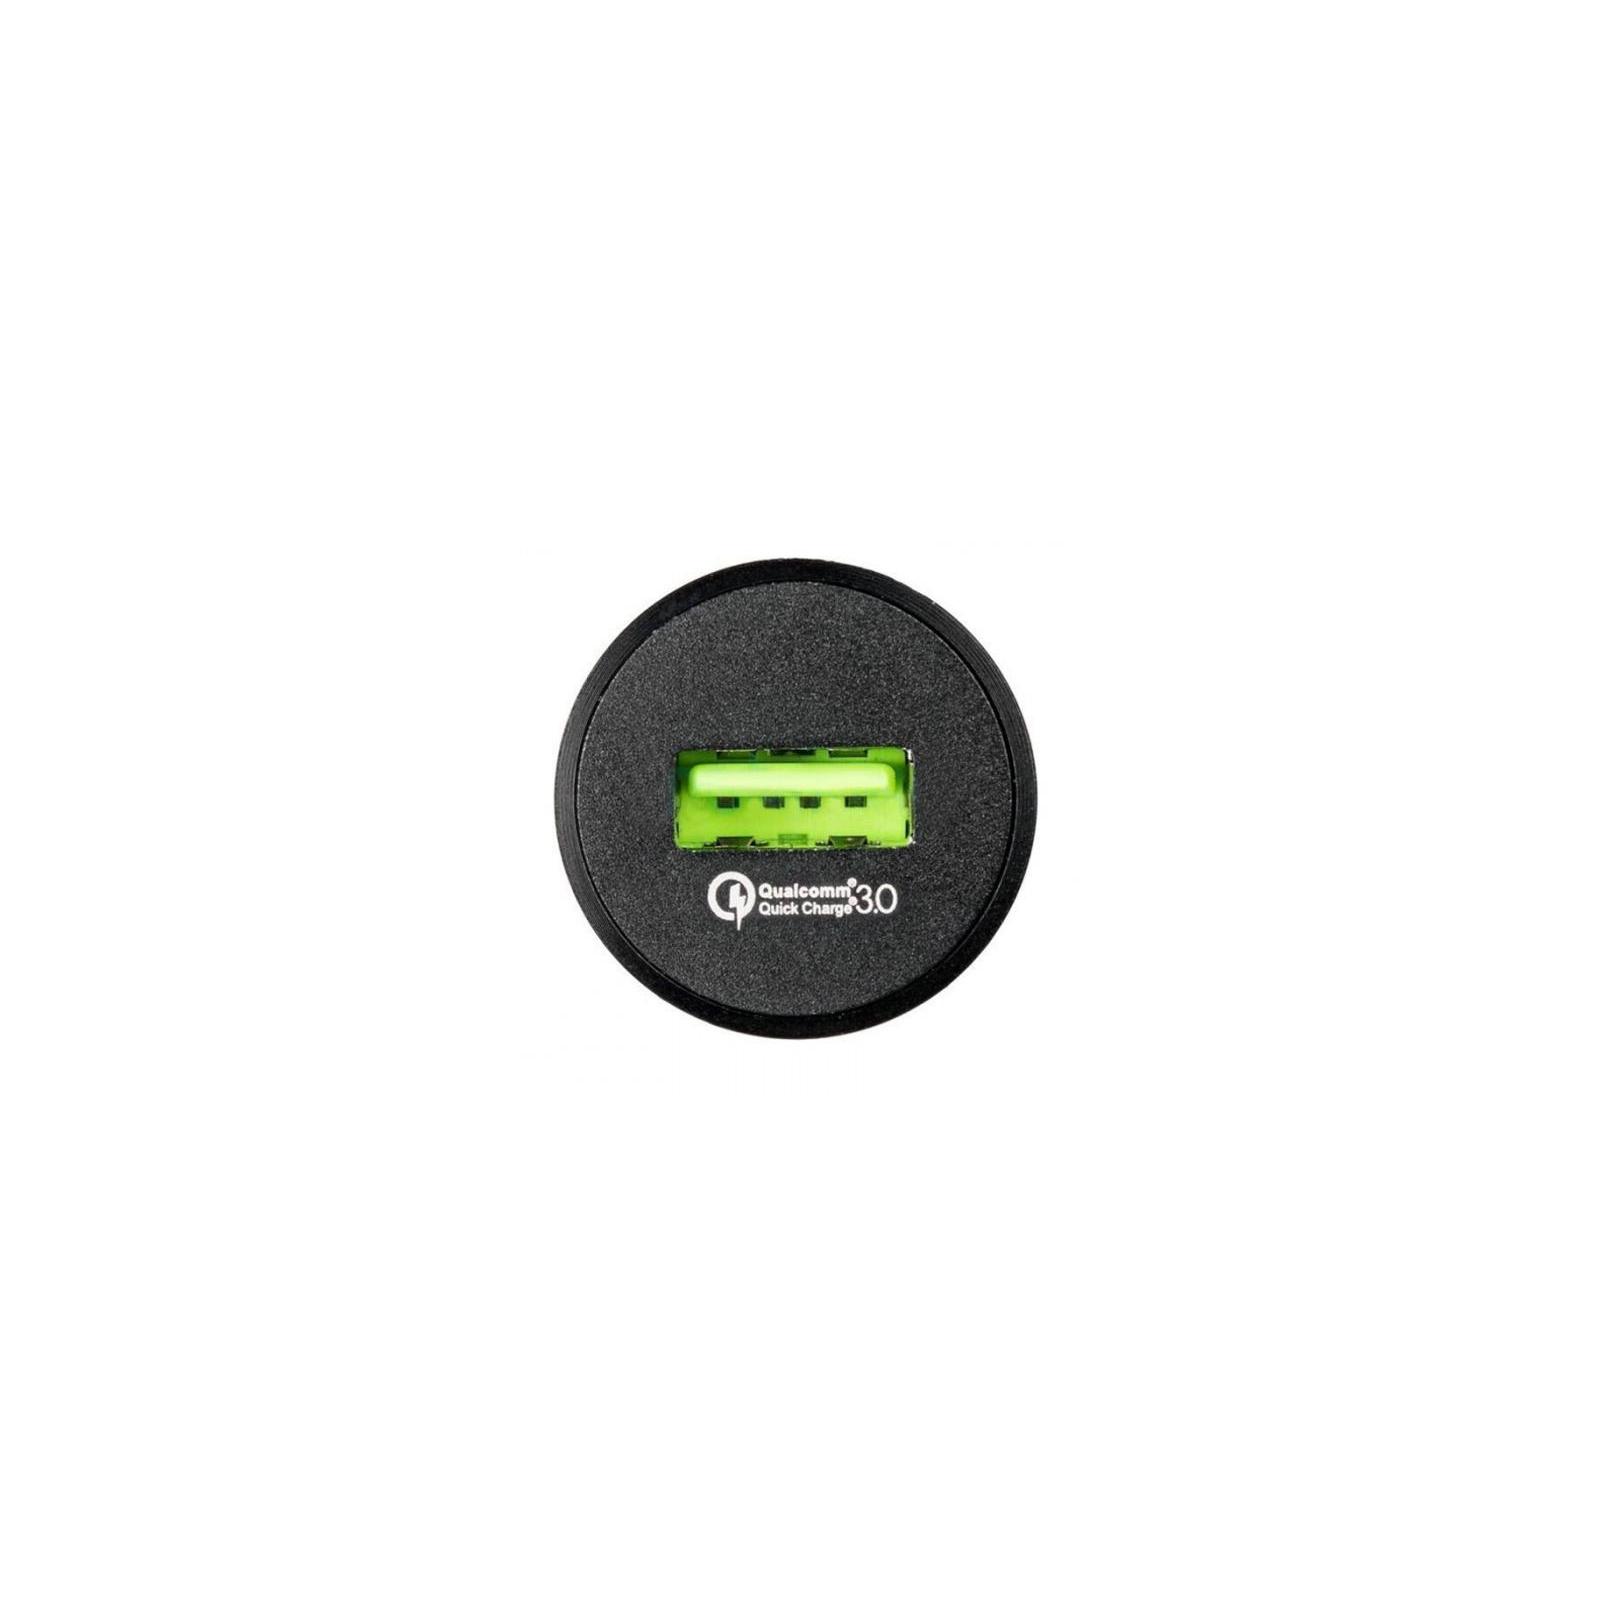 Зарядное устройство Gelius Pro Edition USB Fast Charger 5-12v 3A QC 3.0 (GL-03) Black (63007) изображение 3